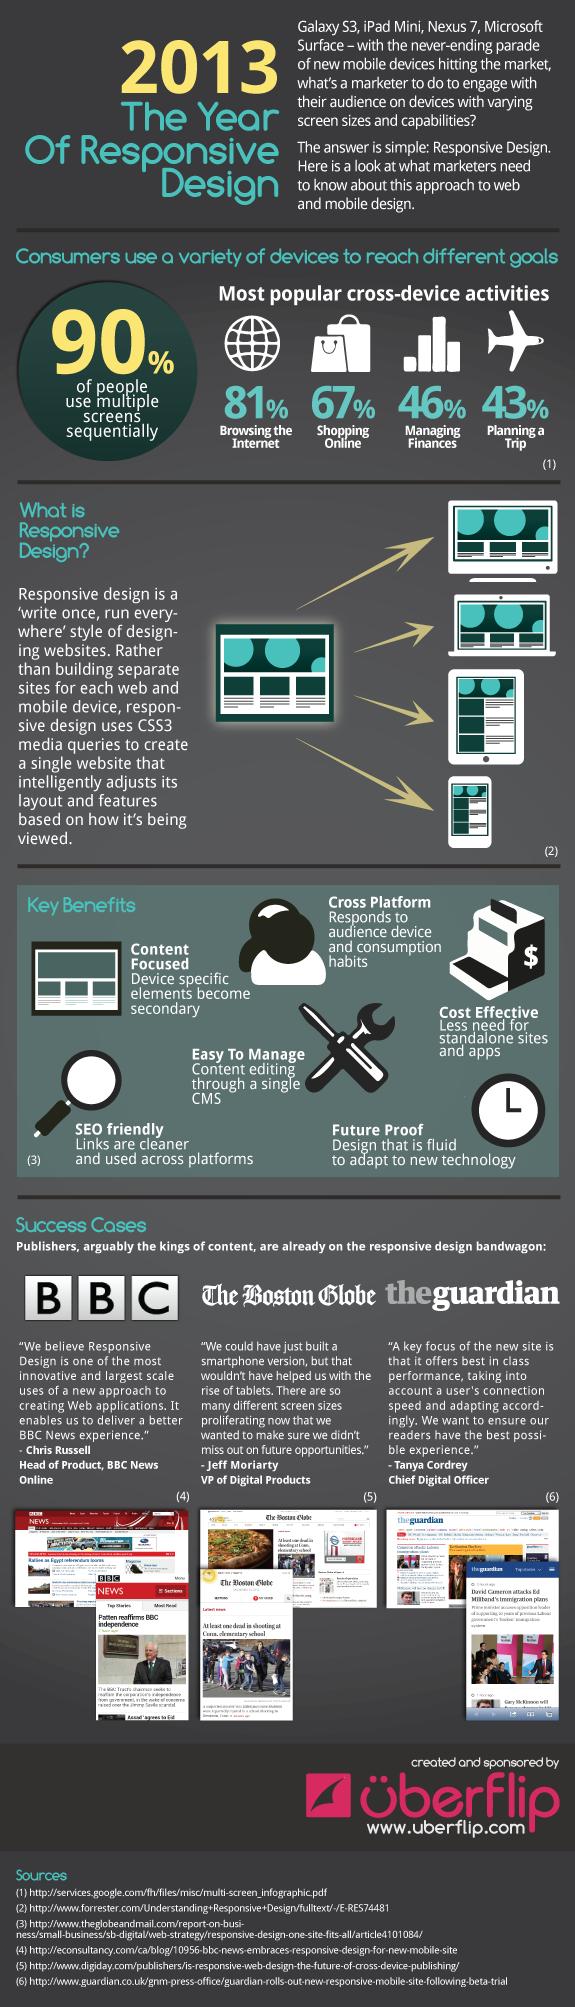 Infographic Responsive Design 2013